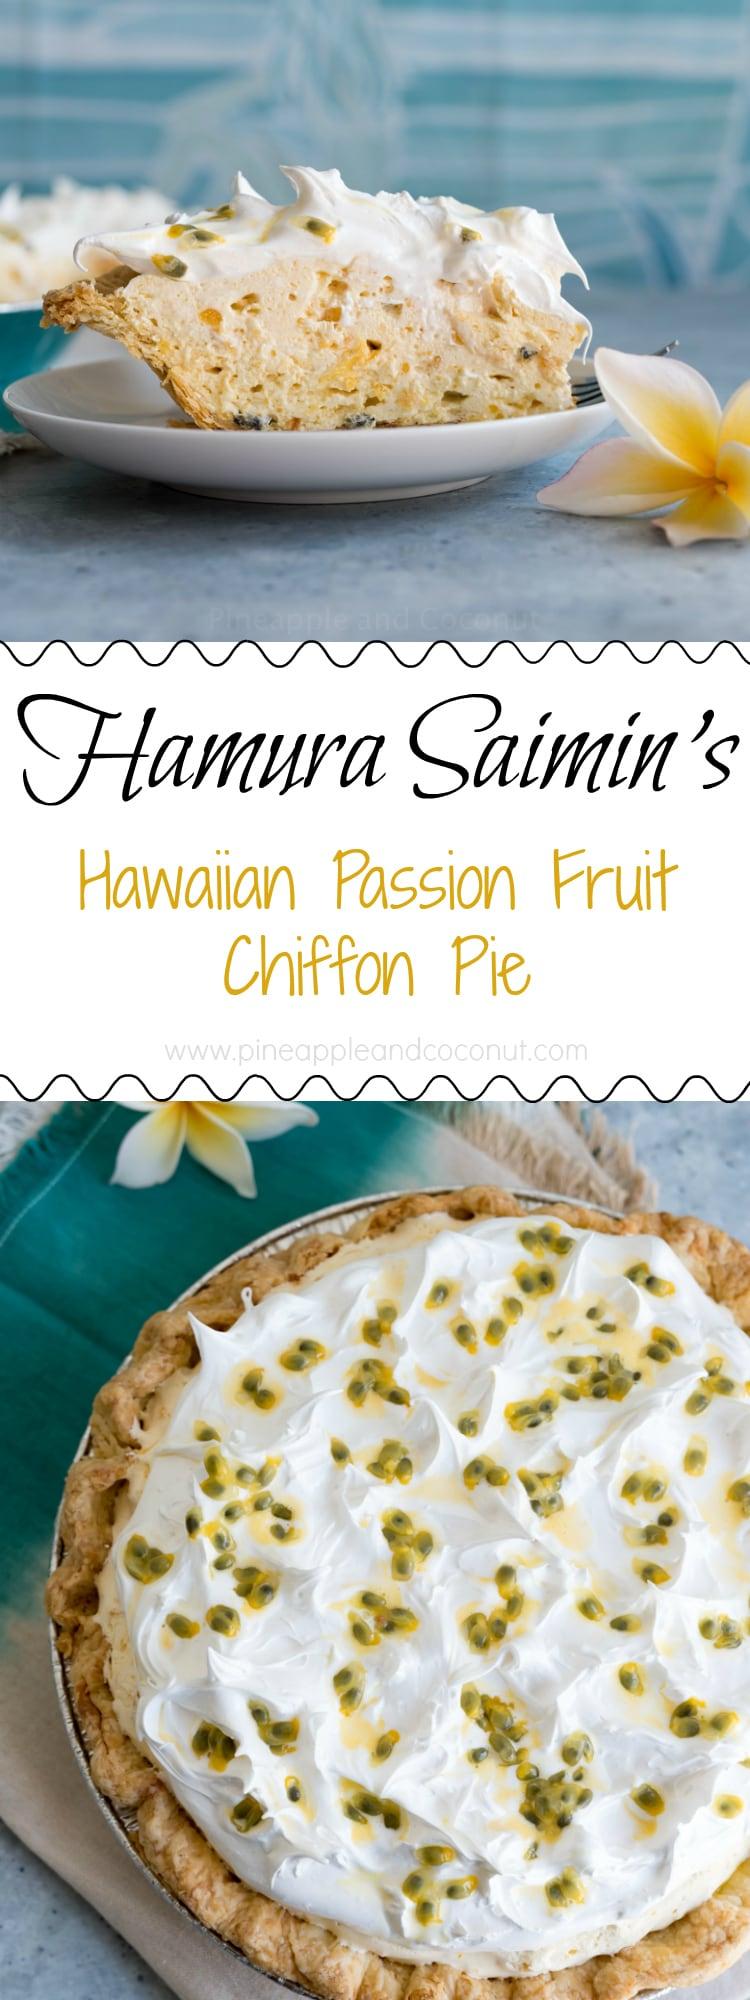 Hawaiian Passion Fruit Chiffon Pie www.pineappleandcoconut.com